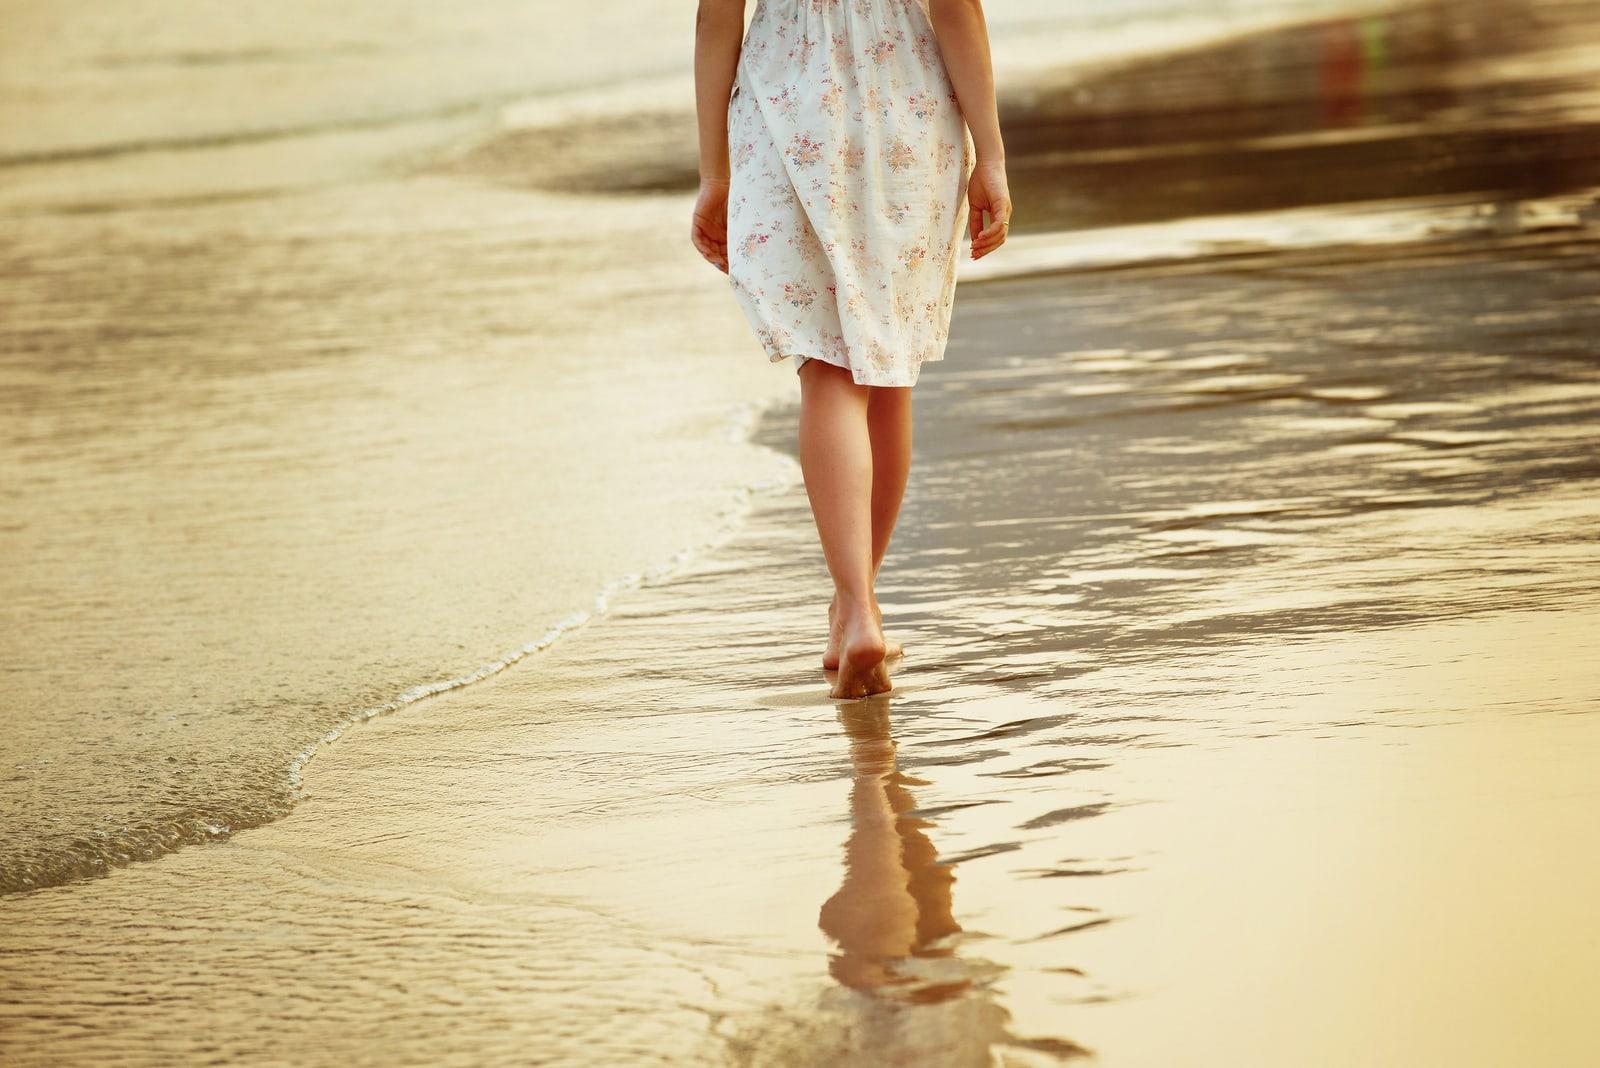 lonely girl is walking along island coastline